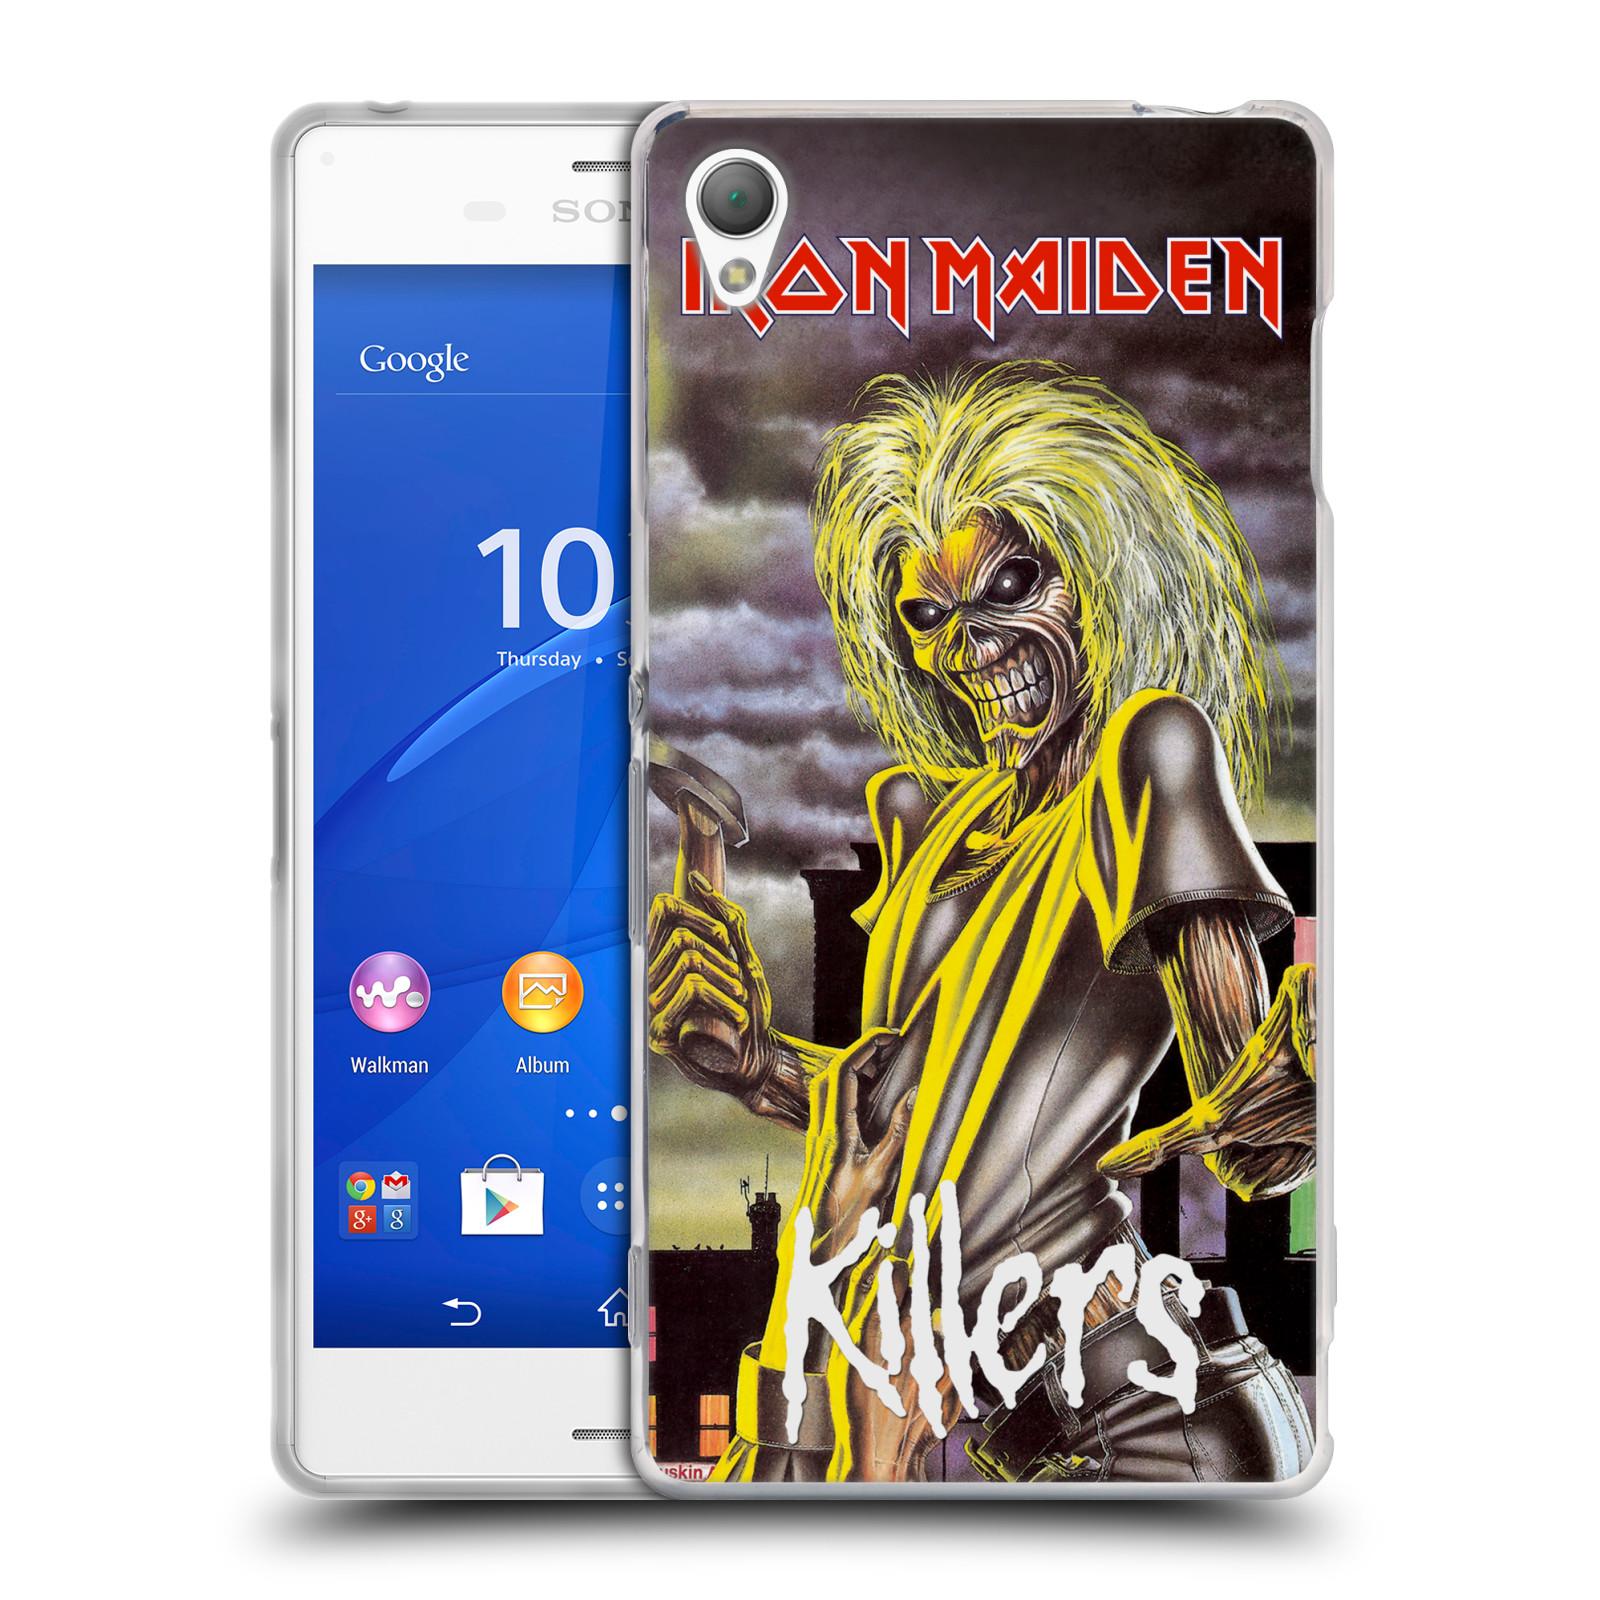 Silikonové pouzdro na mobil Sony Xperia Z3 D6603 HEAD CASE - Iron Maiden - Killers (Silikonový kryt či obal na mobilní telefon s licencovaným motivem Iron Maiden Sony Xperia Z3)